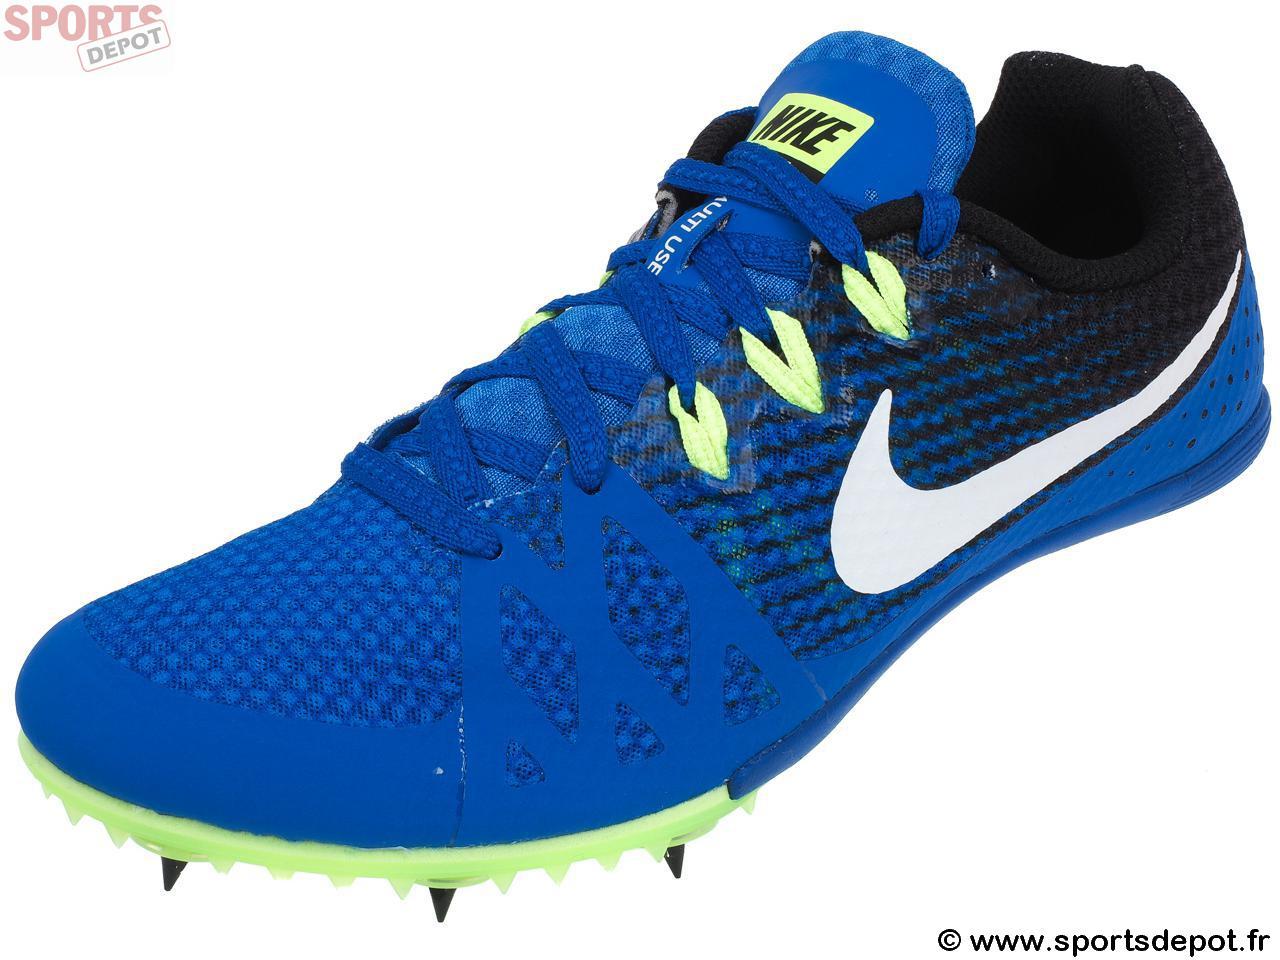 3f3ac4644b9 Acheter Chaussures à pointes d athlétisme NIKE Zoom rival pointe ...